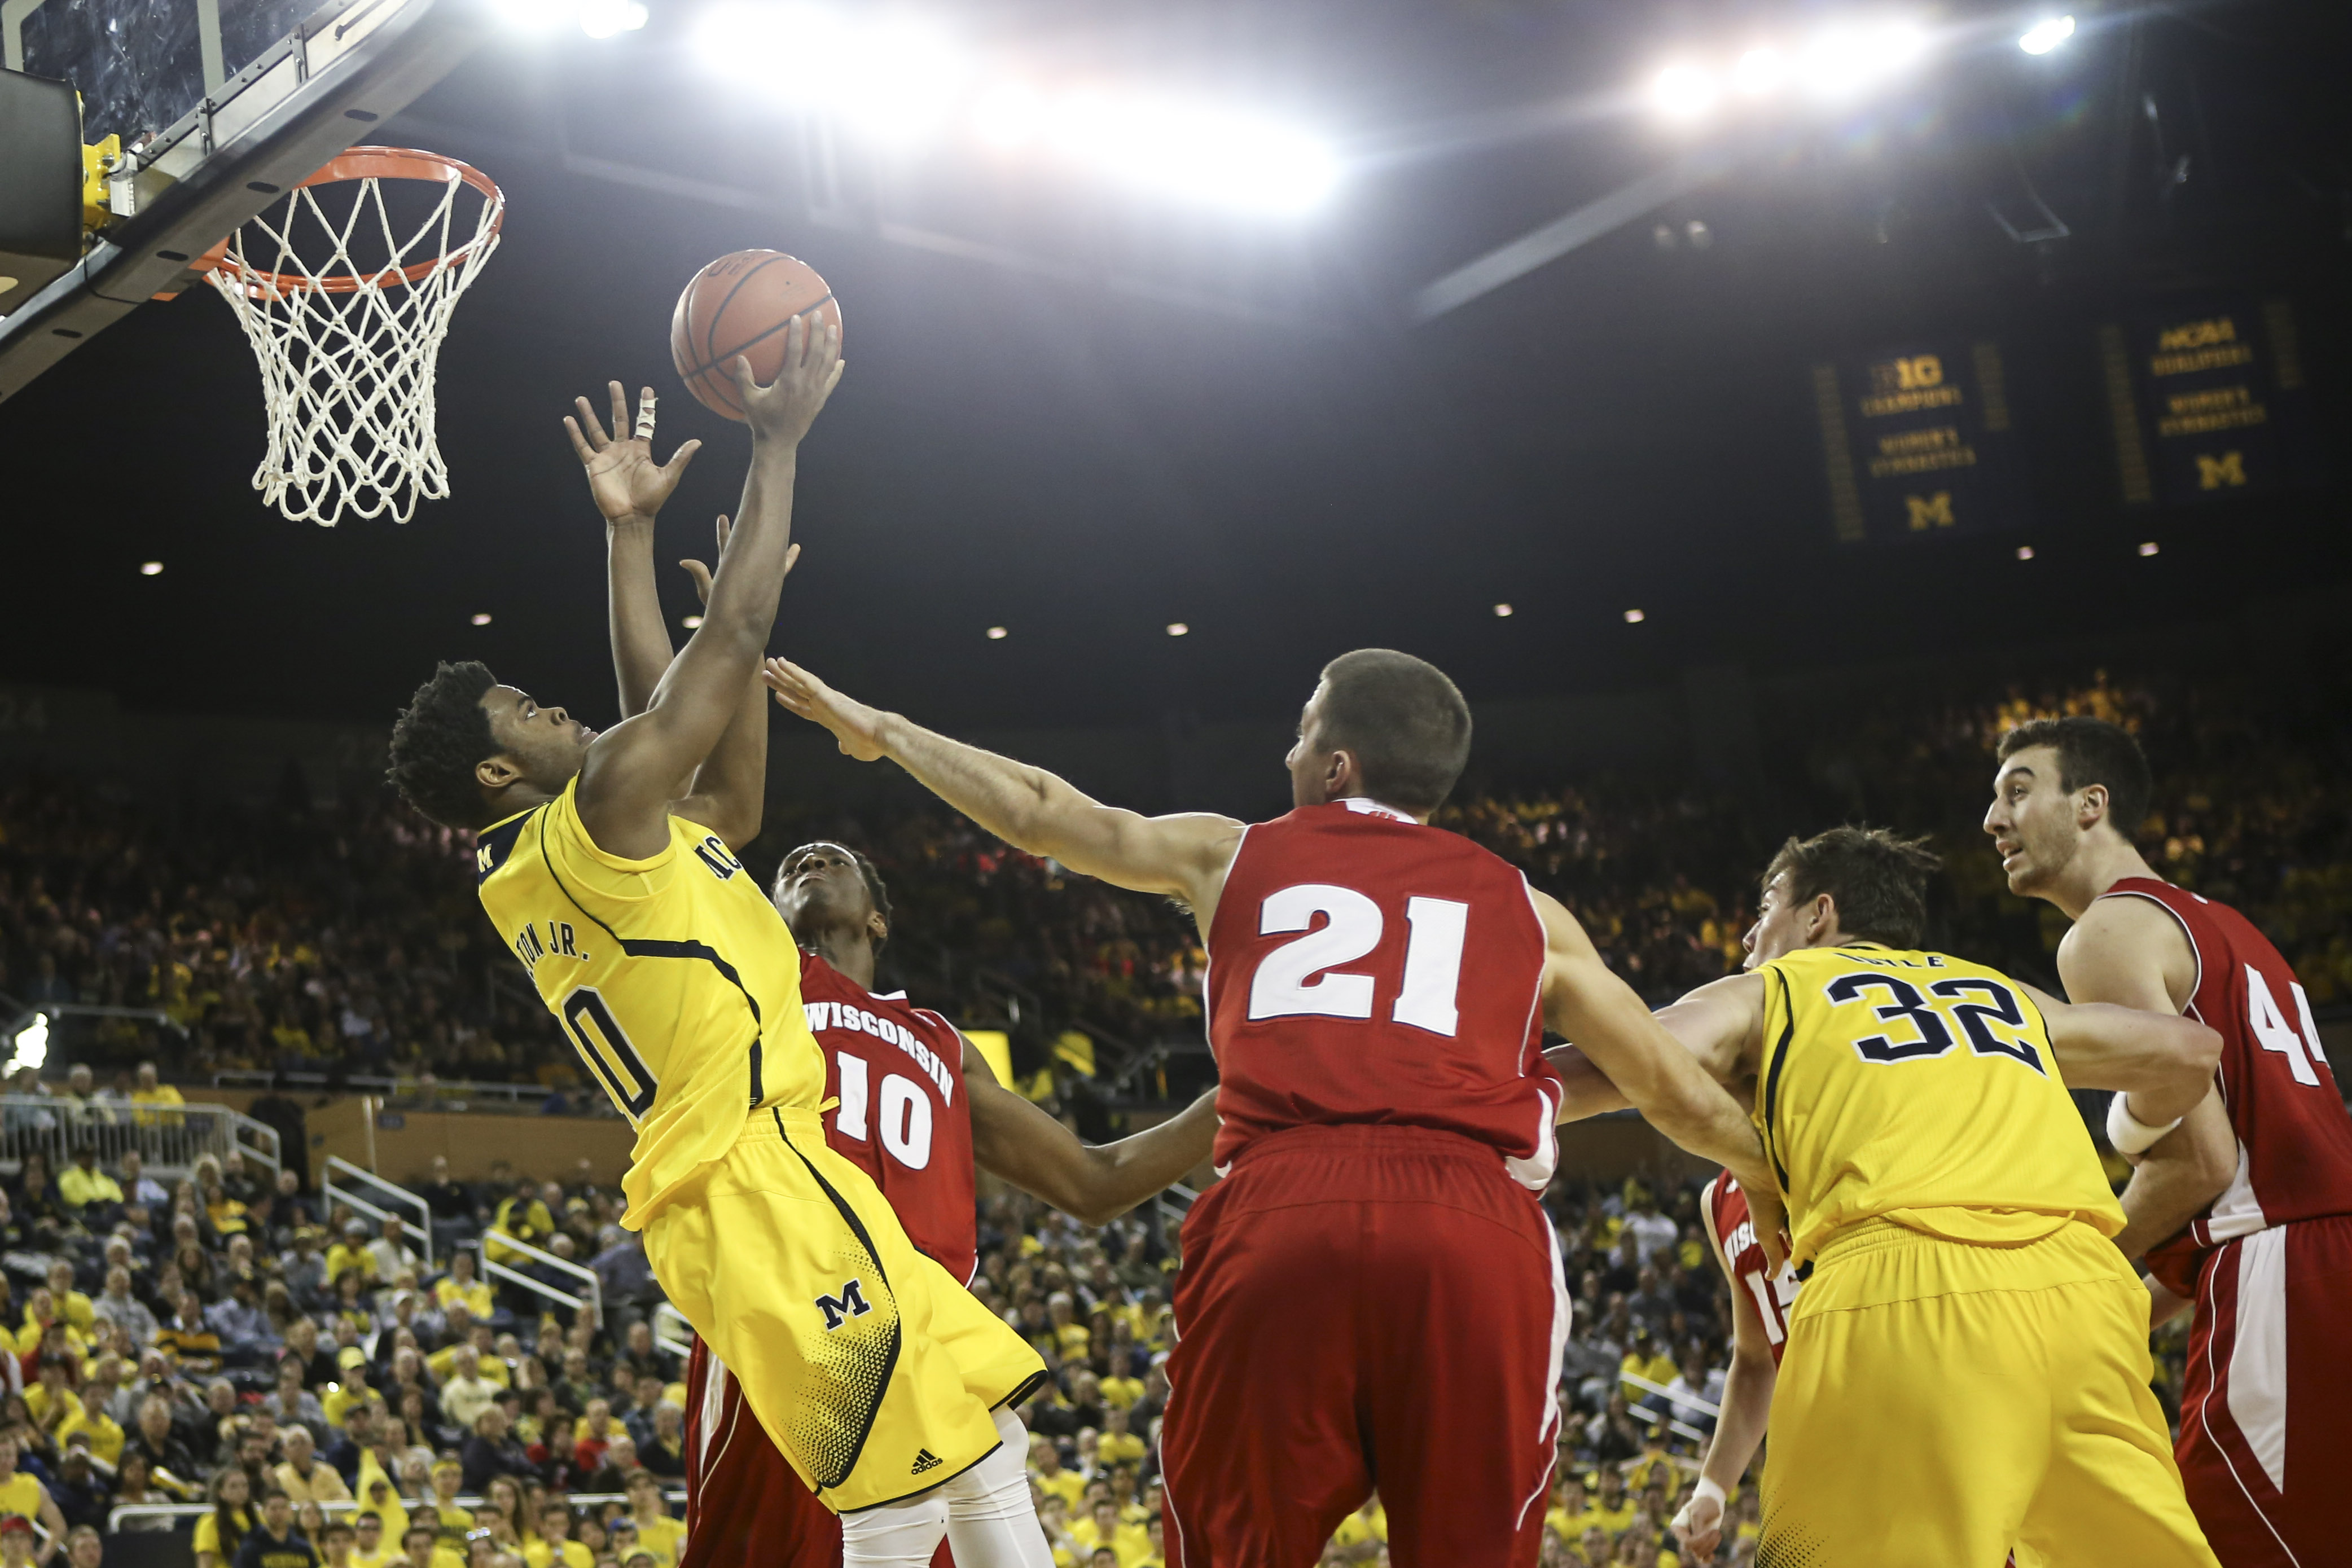 Wisconsin 69, Michigan 64 – #16